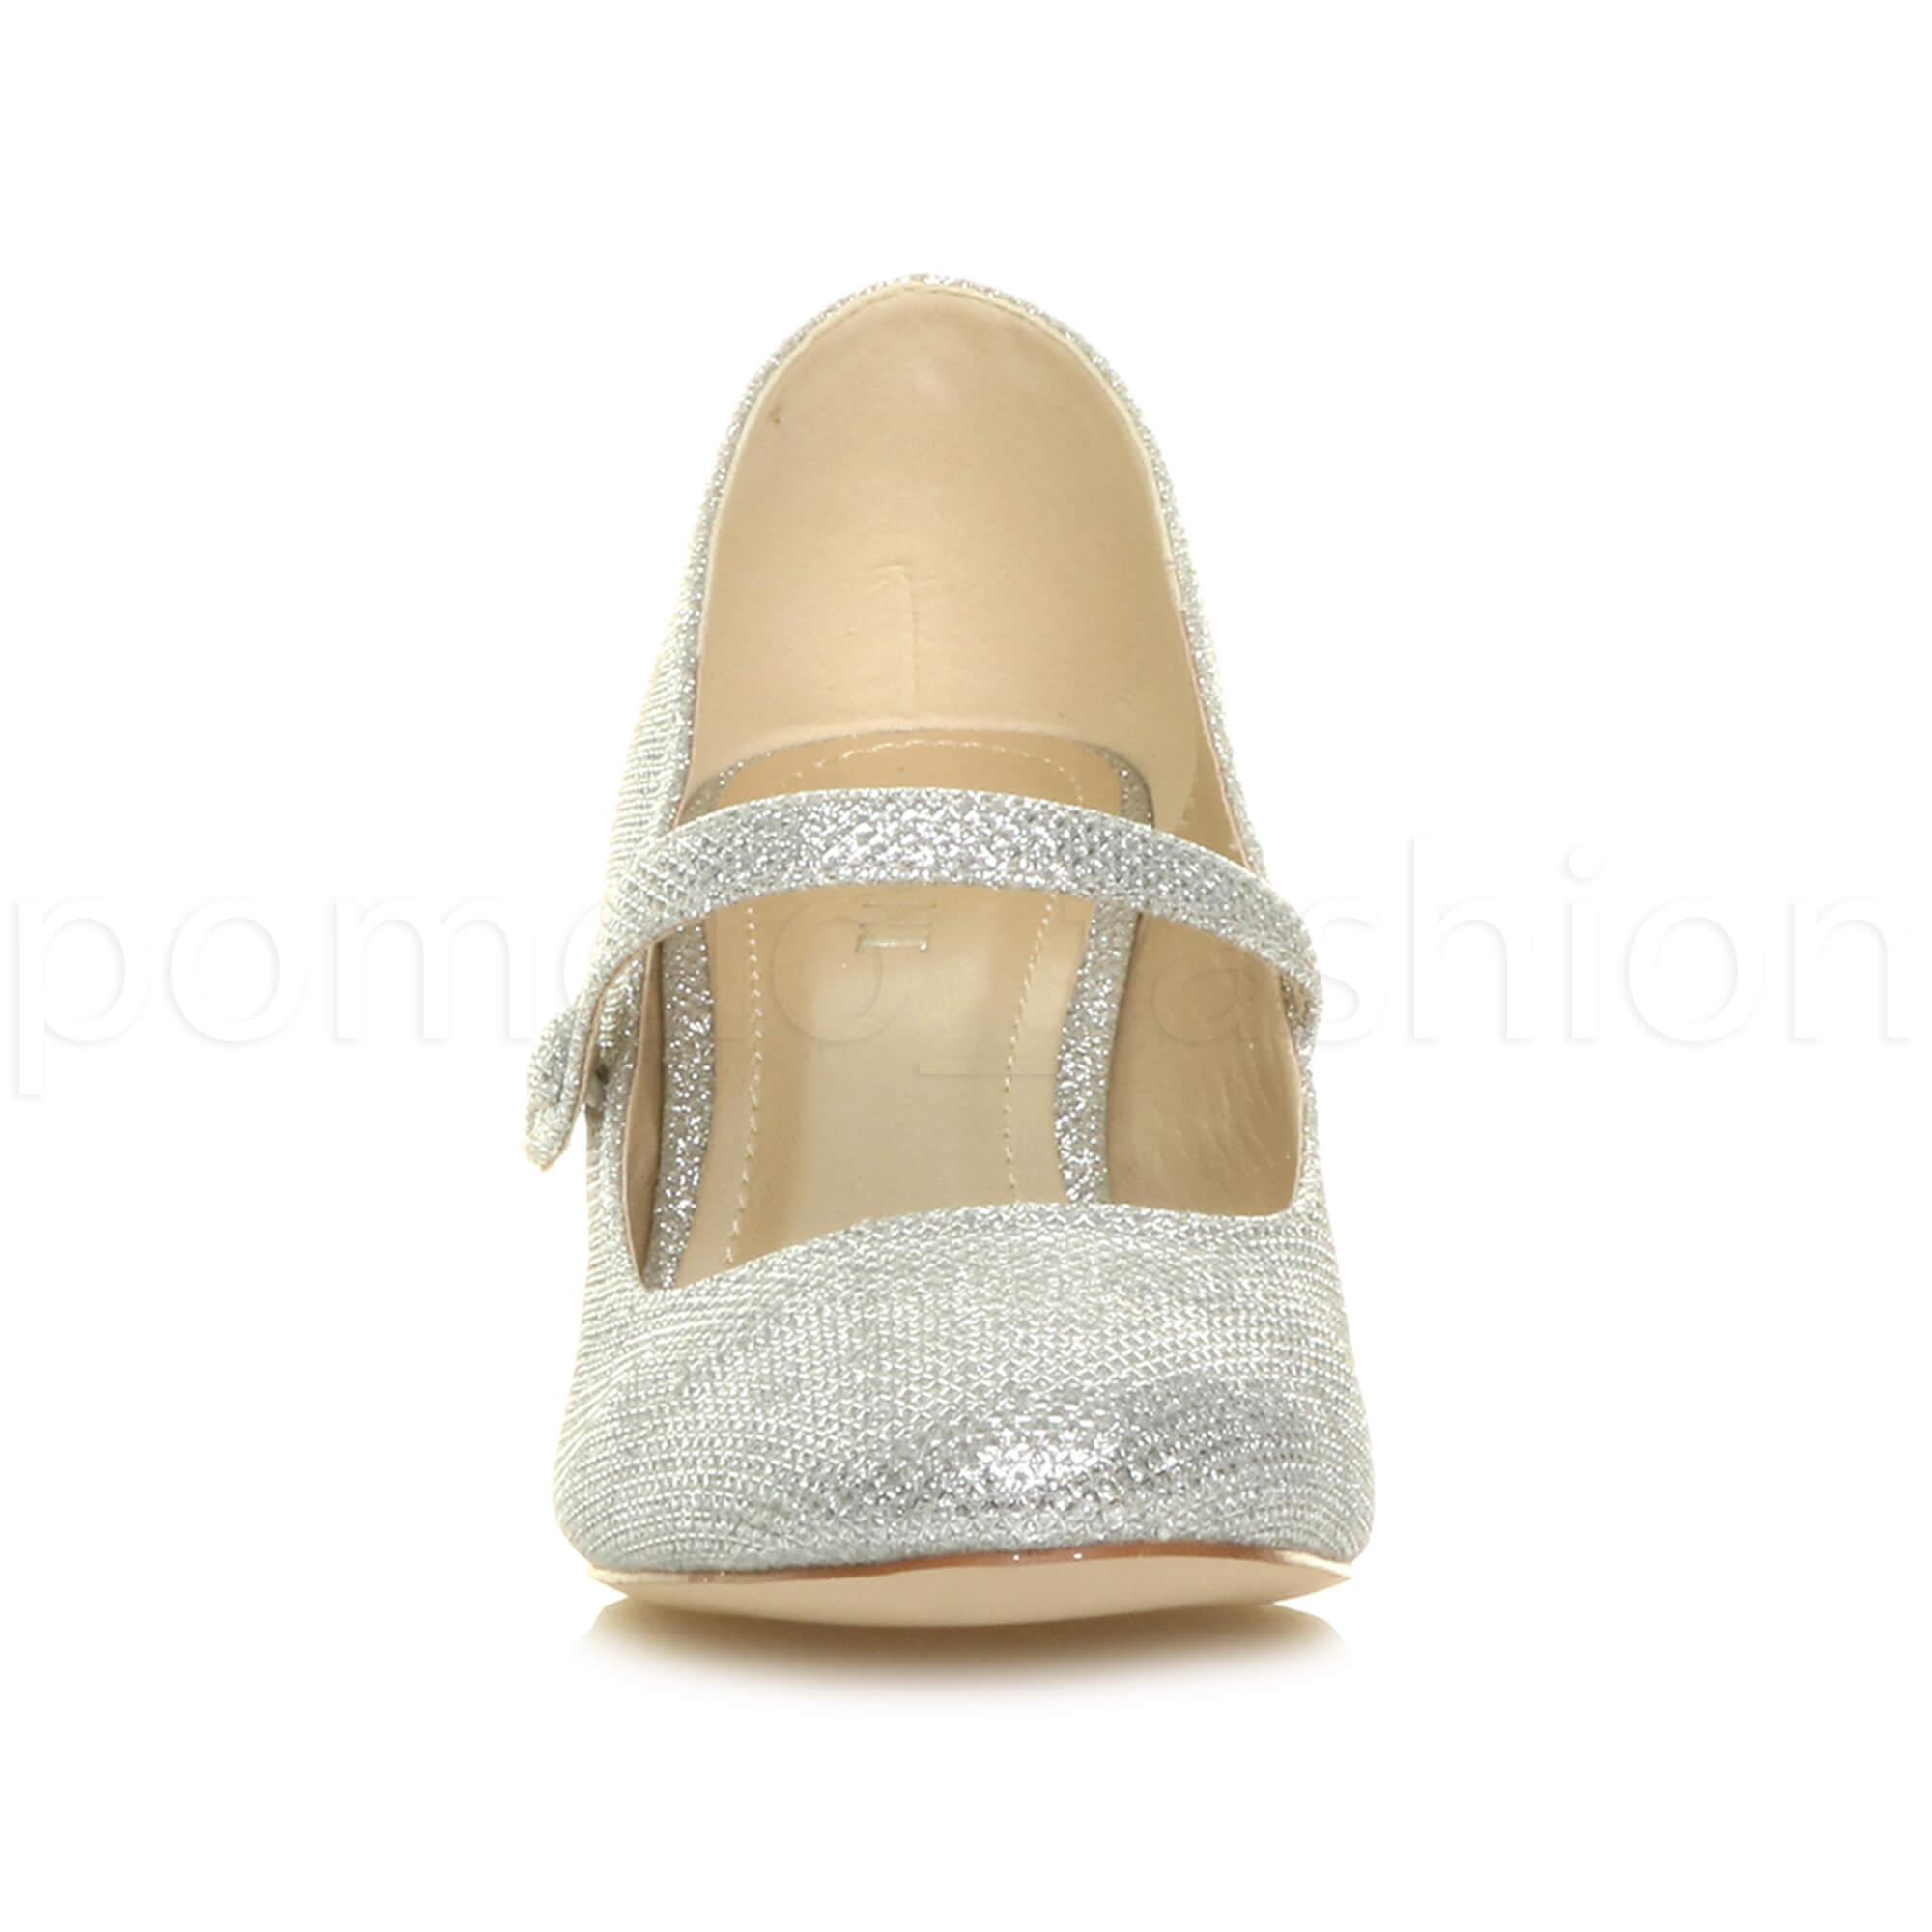 miniatura 167 - Donna basso tacco medio Mary Jane Damigella Matrimonio Pompe Scarpe Da Sera Taglia